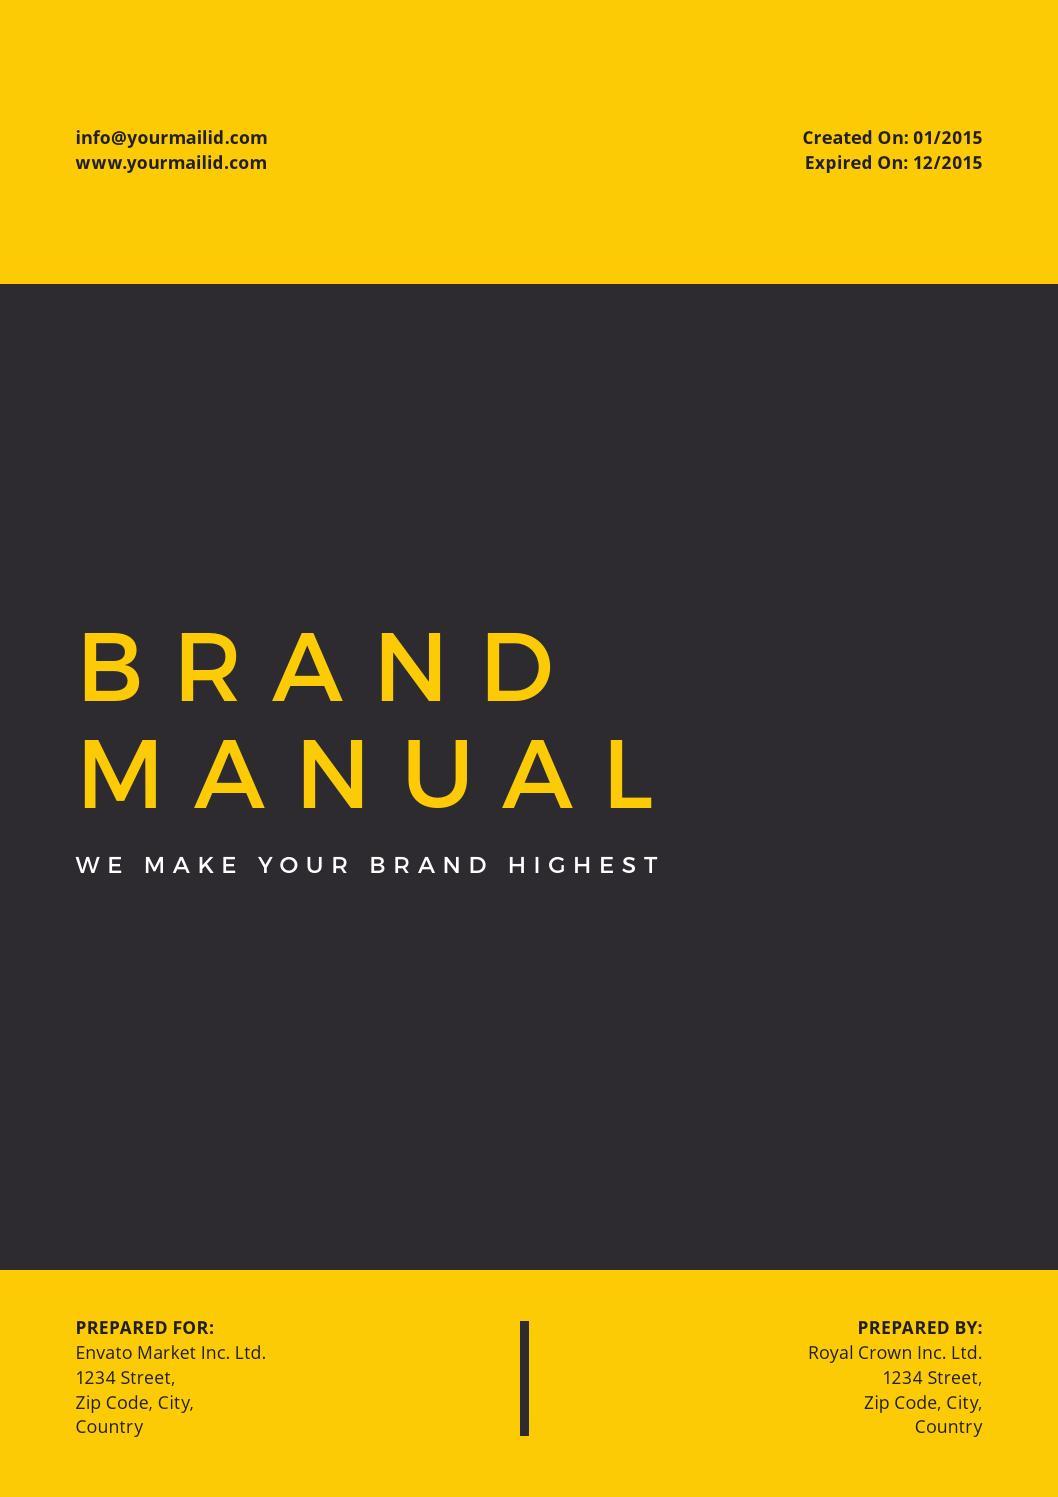 Brand Manual By Royalcrown